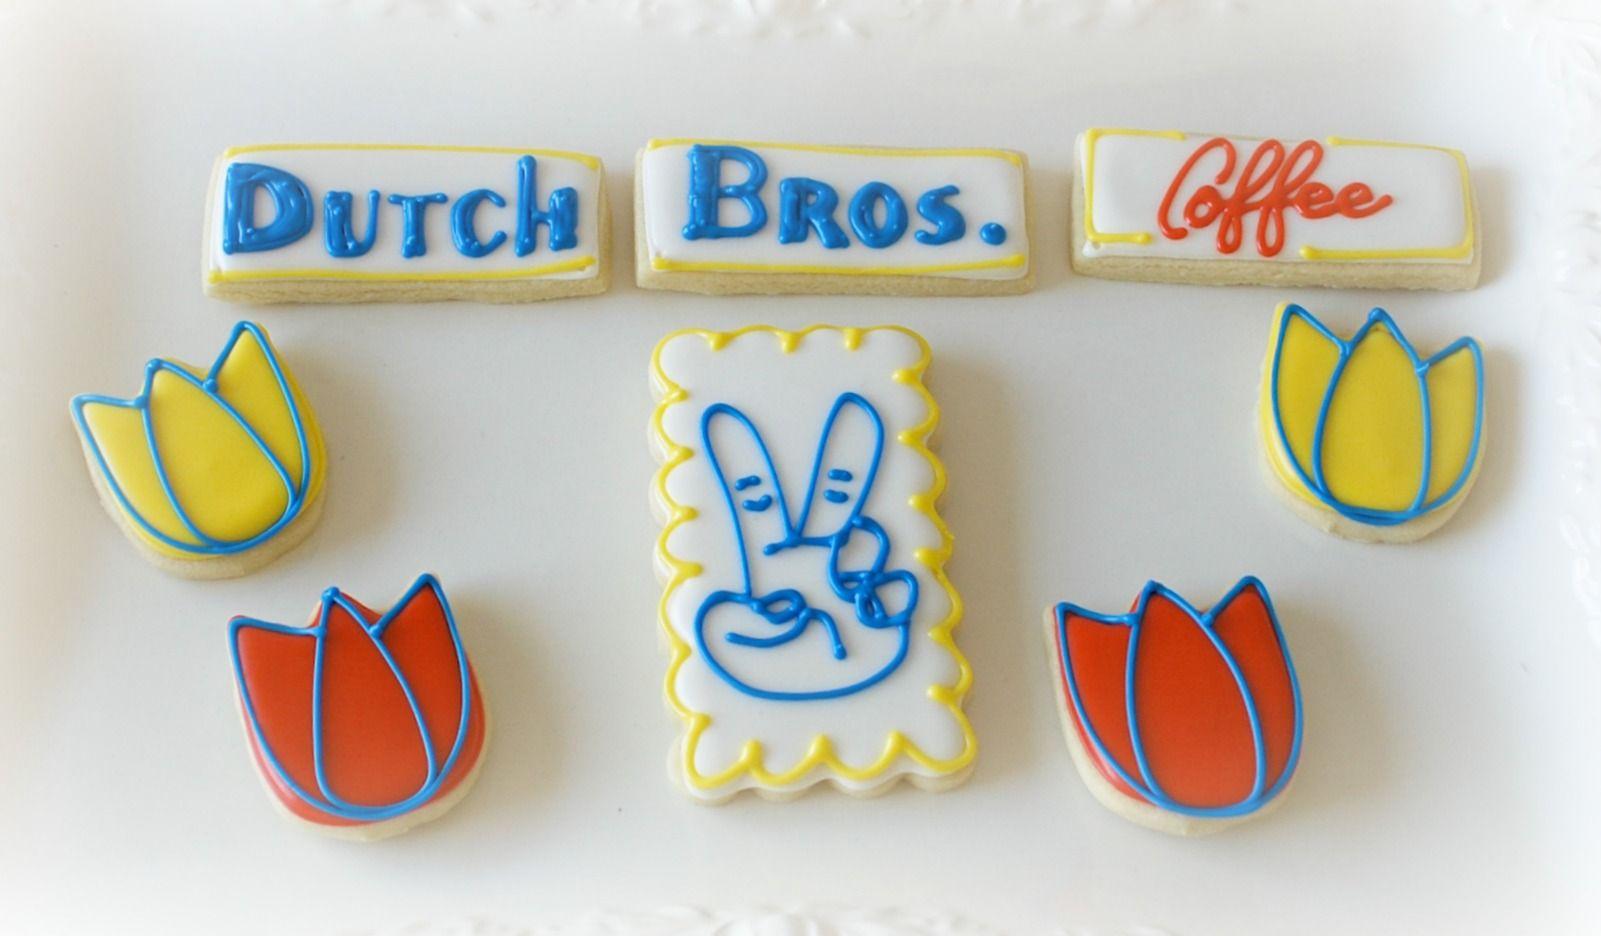 dutch bros cookies the cookie corner dutch bros dutch brothers cookies. Black Bedroom Furniture Sets. Home Design Ideas